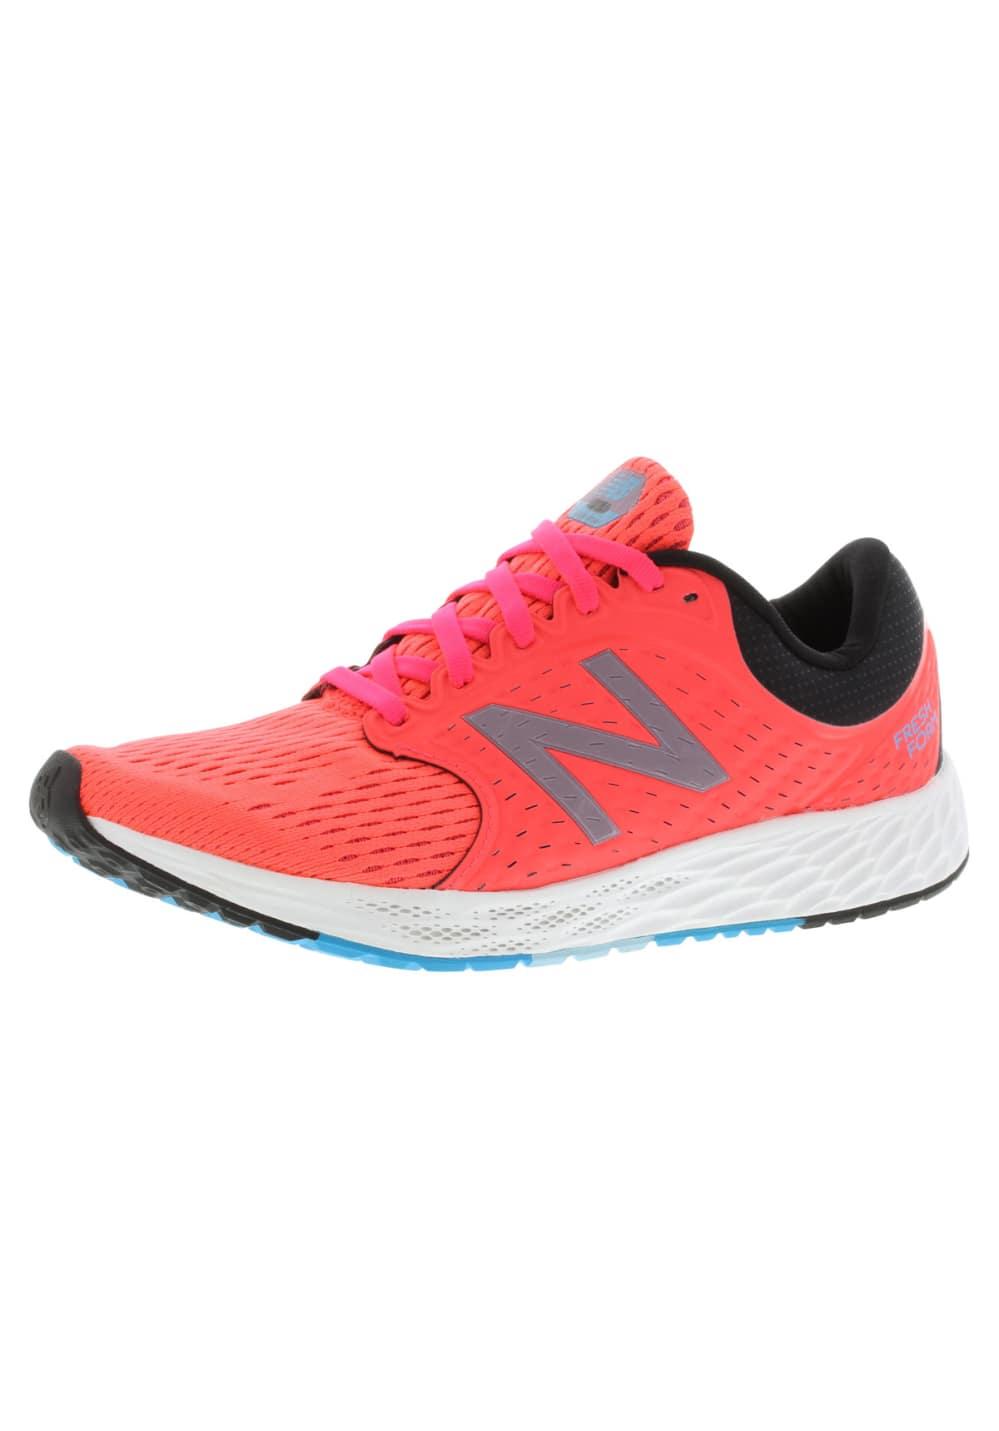 New Balance Fresh Foam Zante - Laufschuhe für Damen - Rot, Gr. 37,5